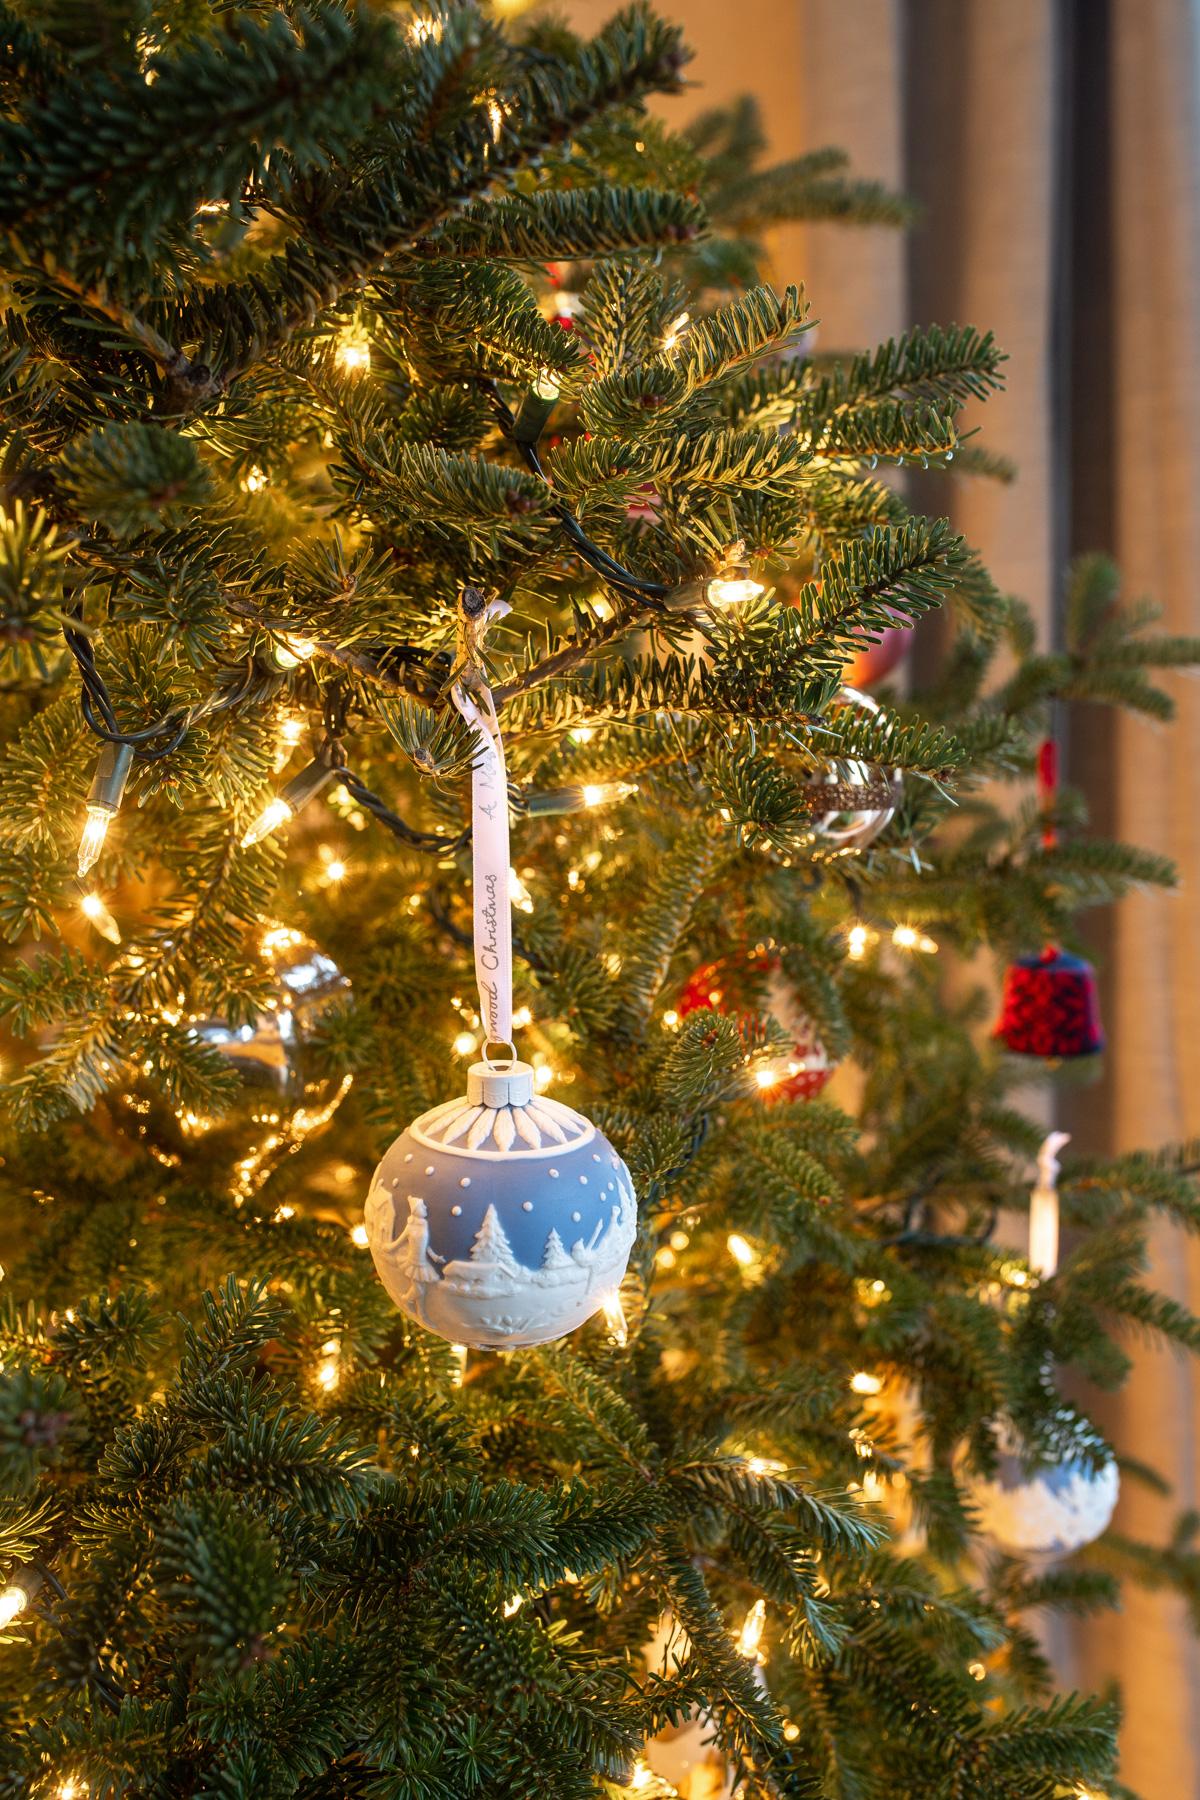 Stacie Flinner x New England Holiday Decorations-12.jpg